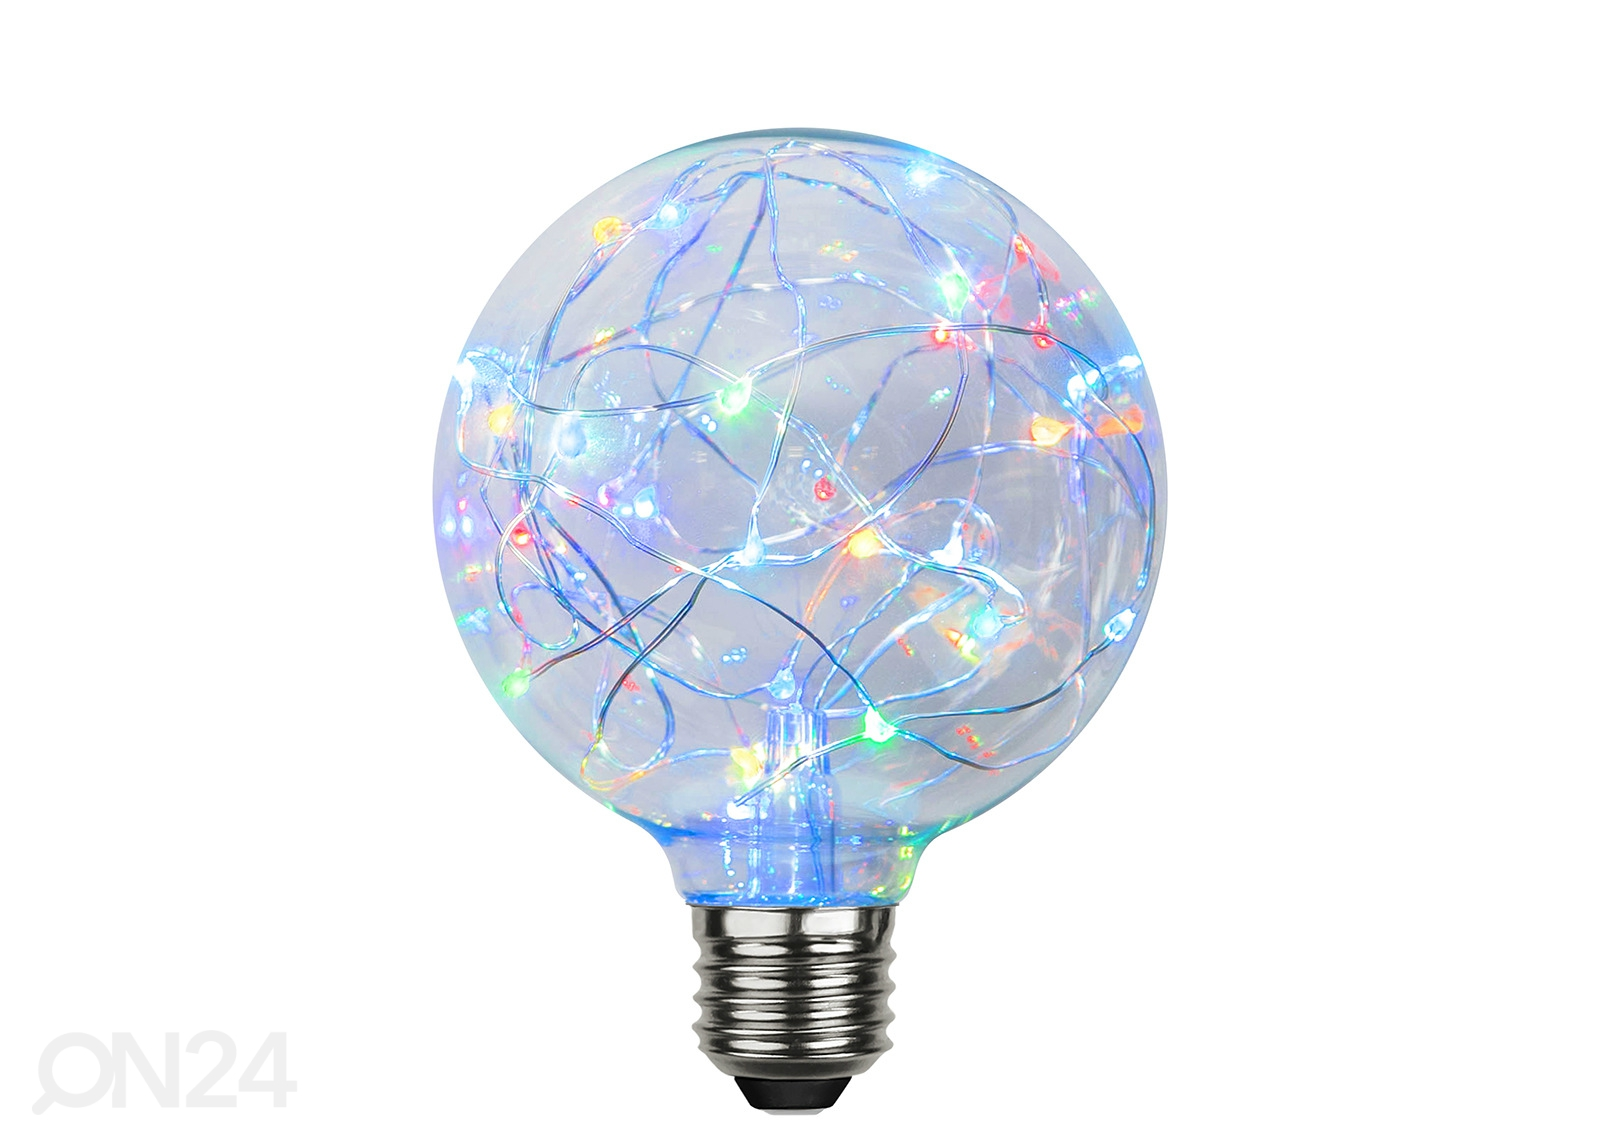 01ba572376e Dekoratiivne LED pirn E27 1,5 W AA-142476 - ON24 Sisustuskaubamaja